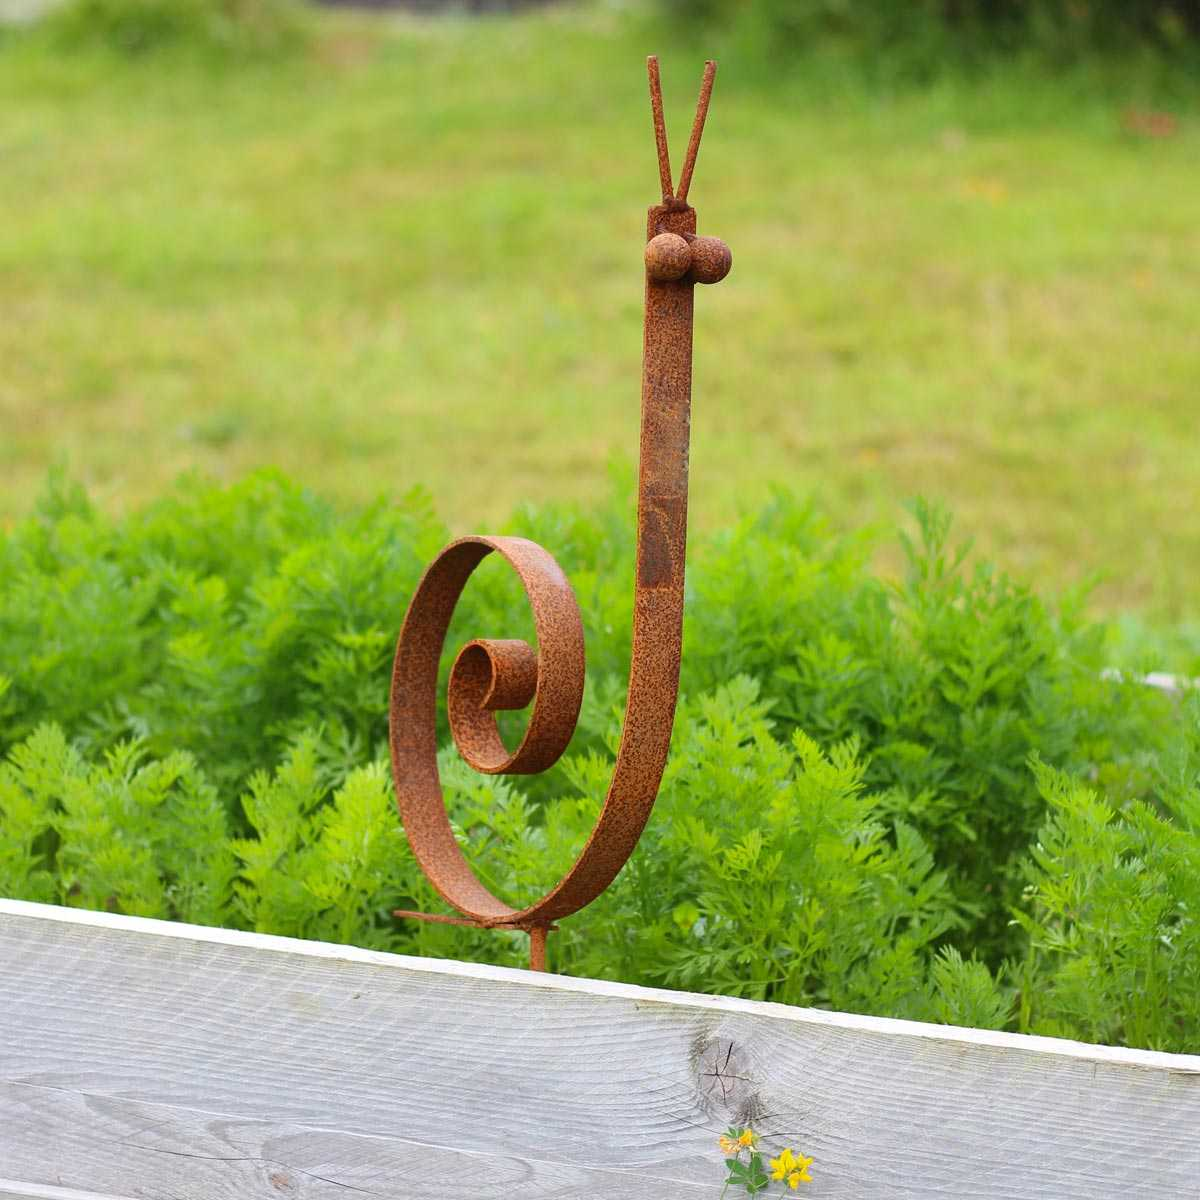 escargot deco de jardin en metal vente au meilleur prix jardins animes